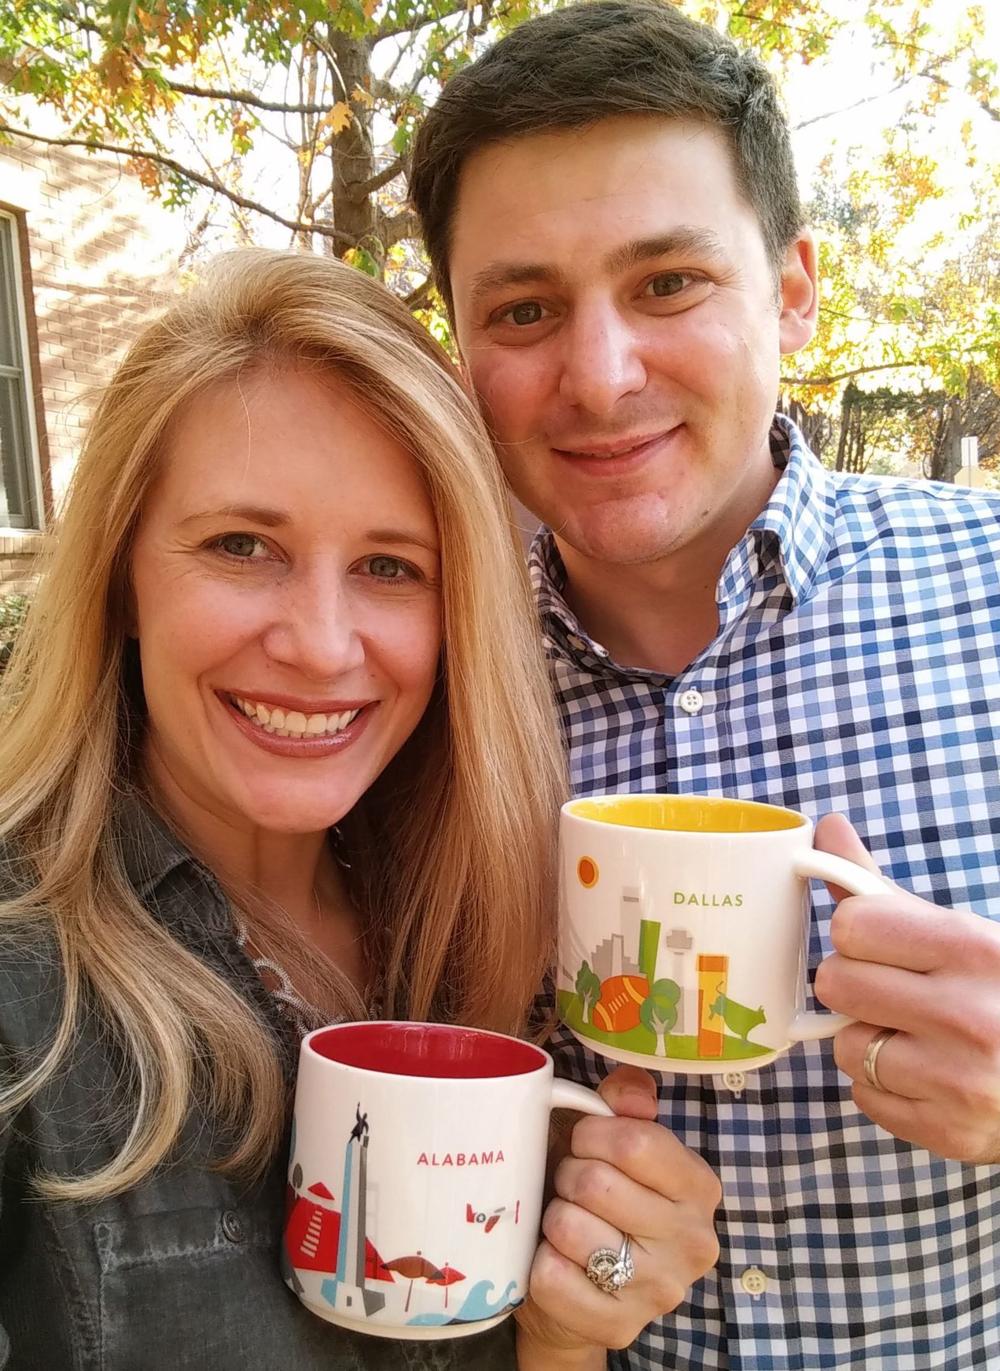 Alabama and Dallas mugs!  Thank you, SBUX.